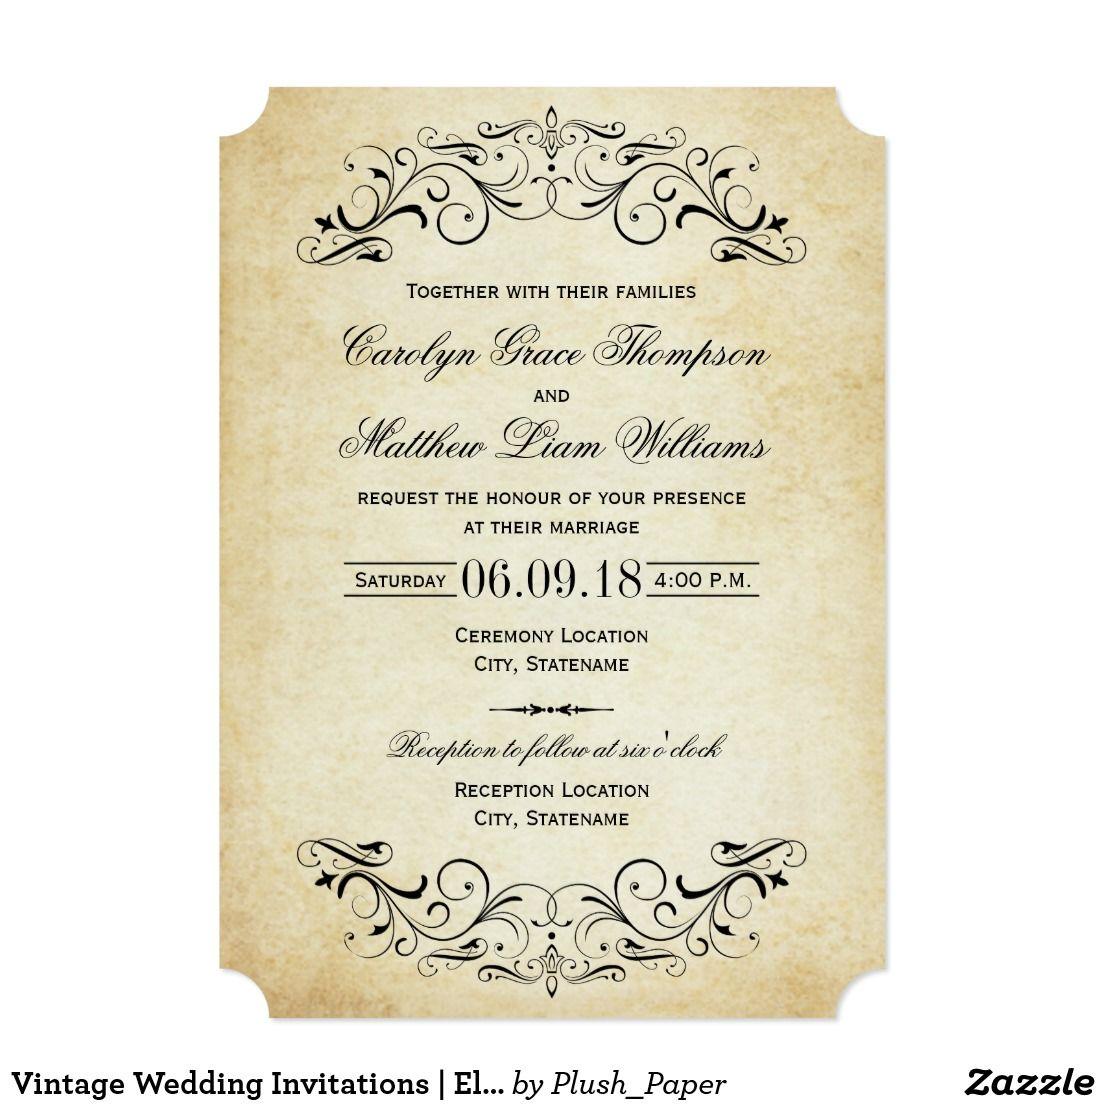 Vintage Wedding Invitations Elegant Flourish Decorative Swirls And Flourishes Frame This Inspired Invitation Design: Vintage Flourish Wedding Invitations Diy At Reisefeber.org